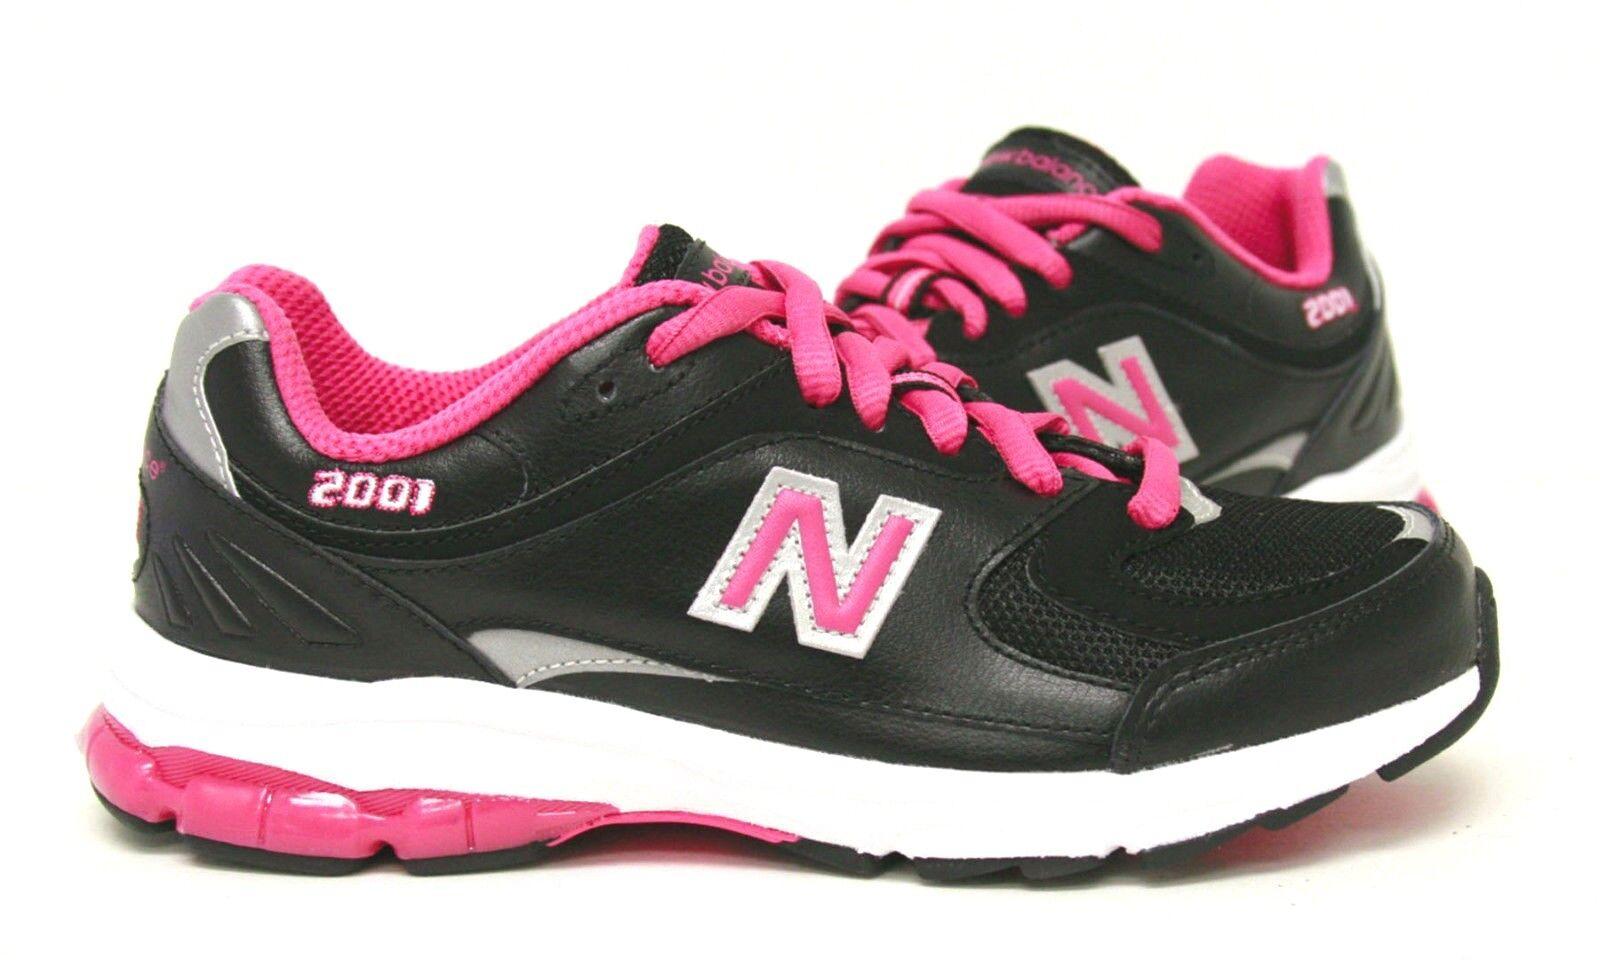 NEU Balance K2001 Running Schuhes K2001BPG Youth 47 Damenschuhe 5.58.5 available